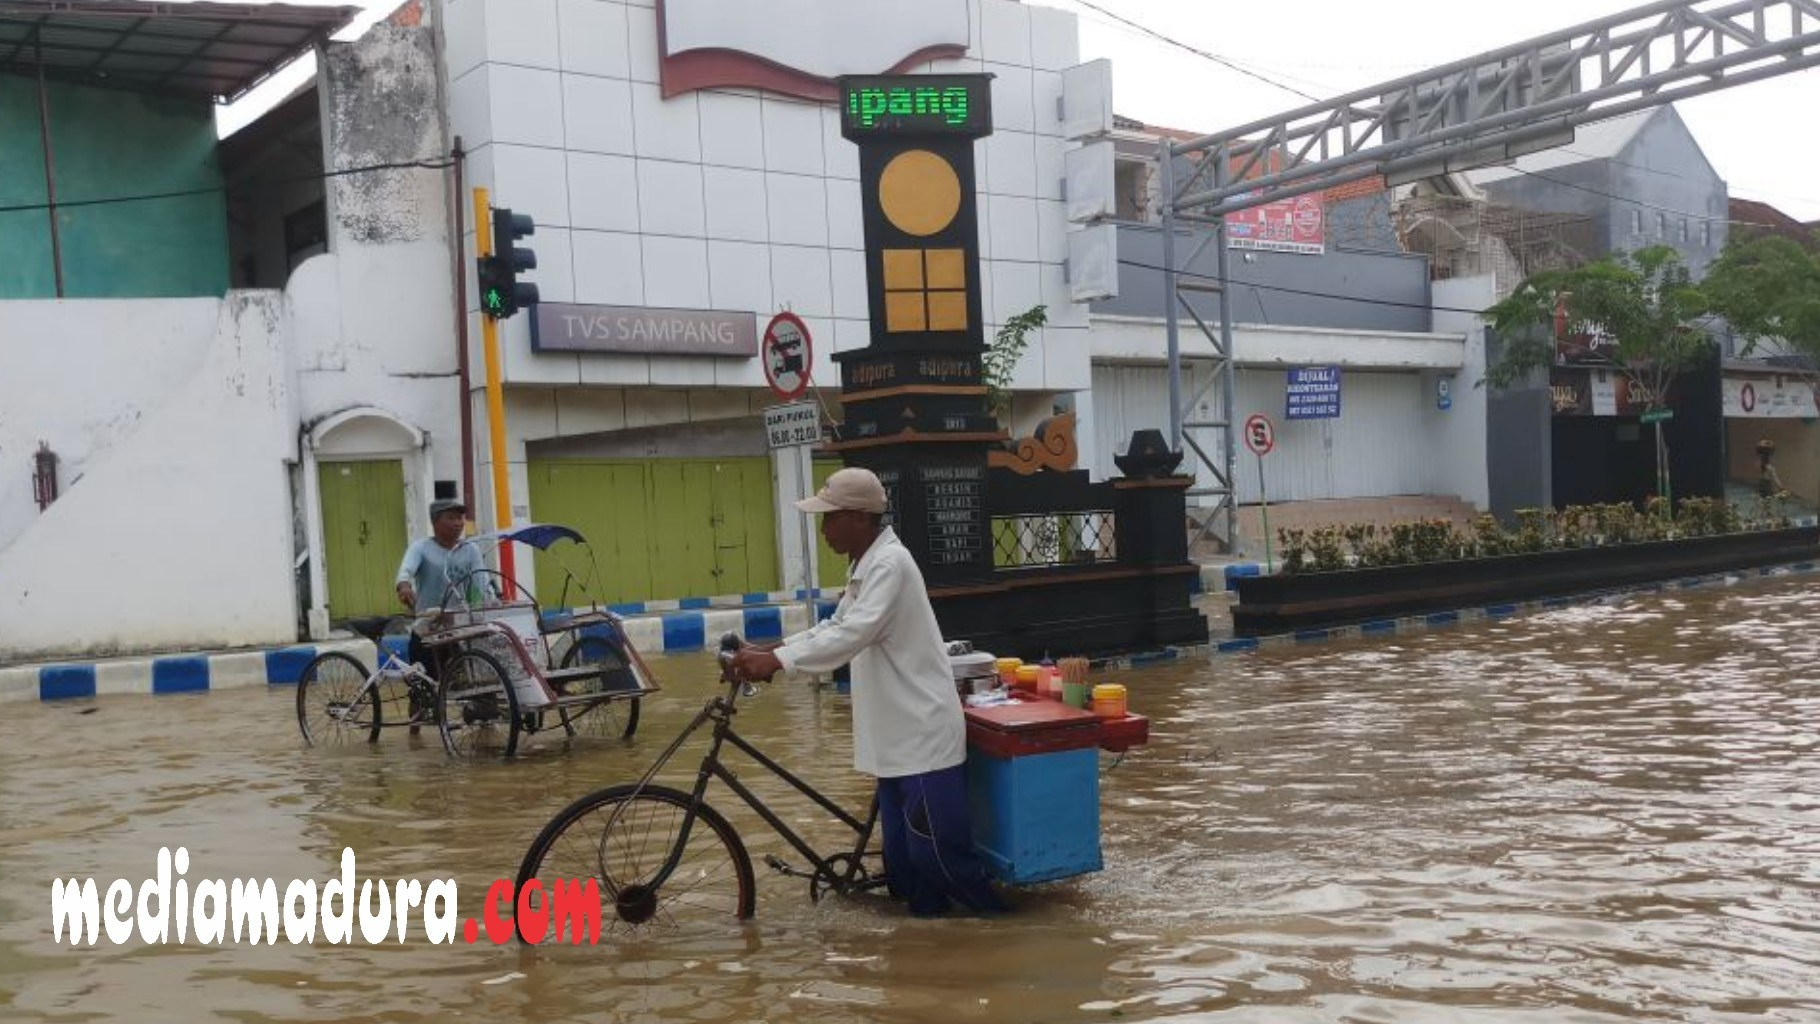 Kota Sampang Kembali Dilanda Banjir Media Madura Warga Melintas Genangan